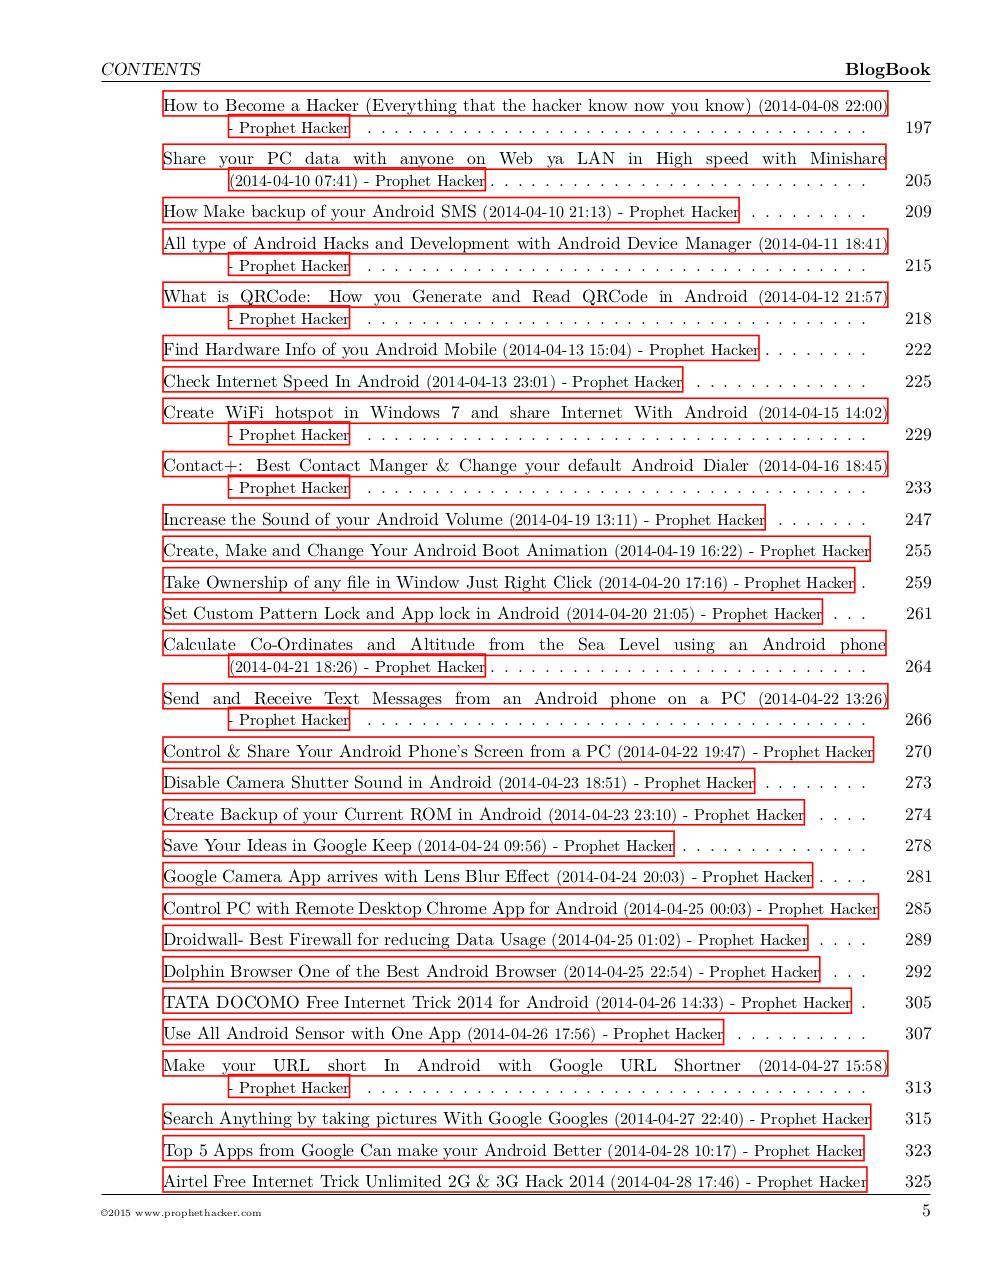 Prophet Hacker Android Hacking Blog Book par Vinay Kumar - Fichier PDF